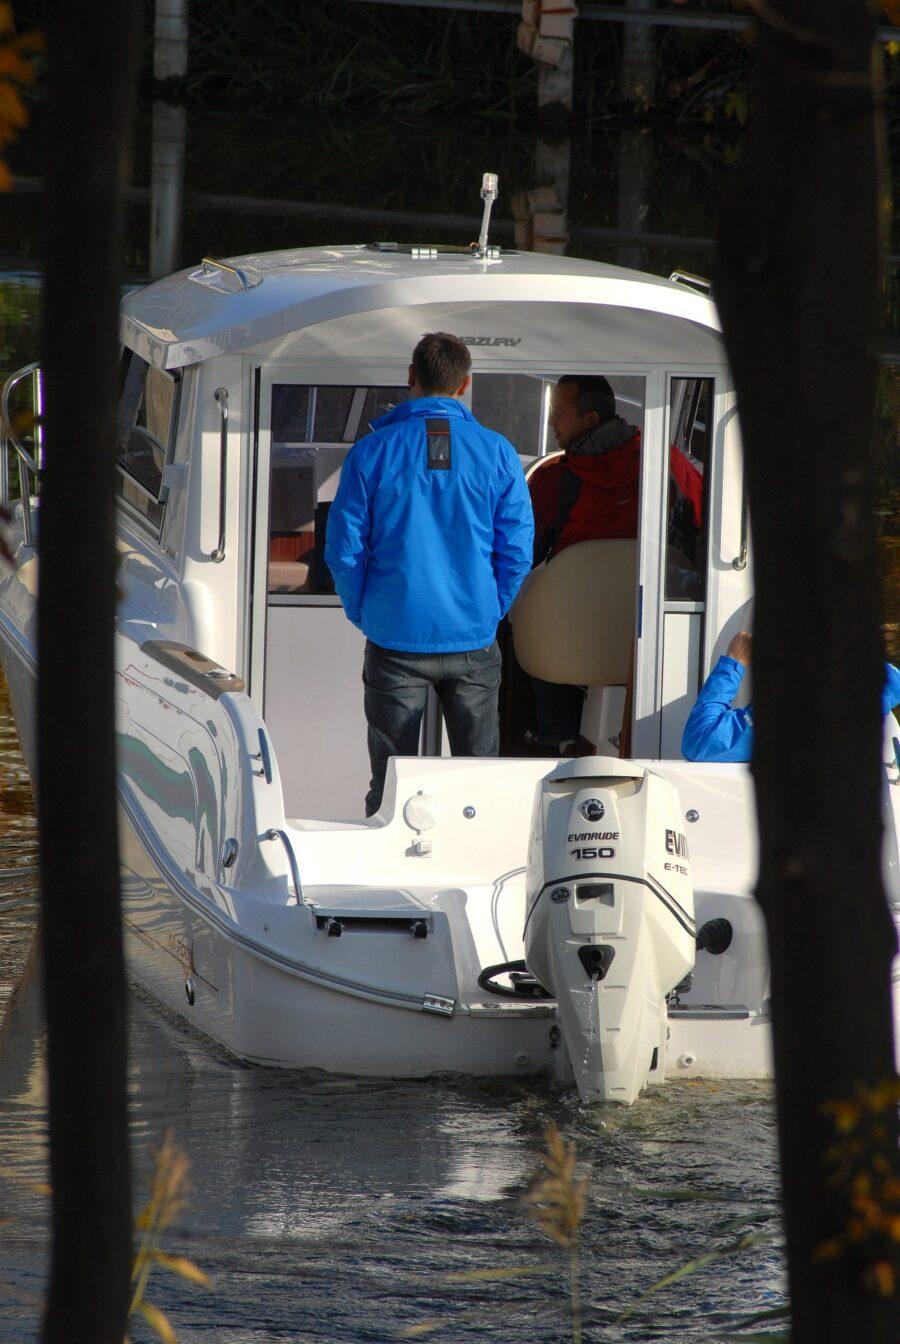 mazury 700 cc speed boat